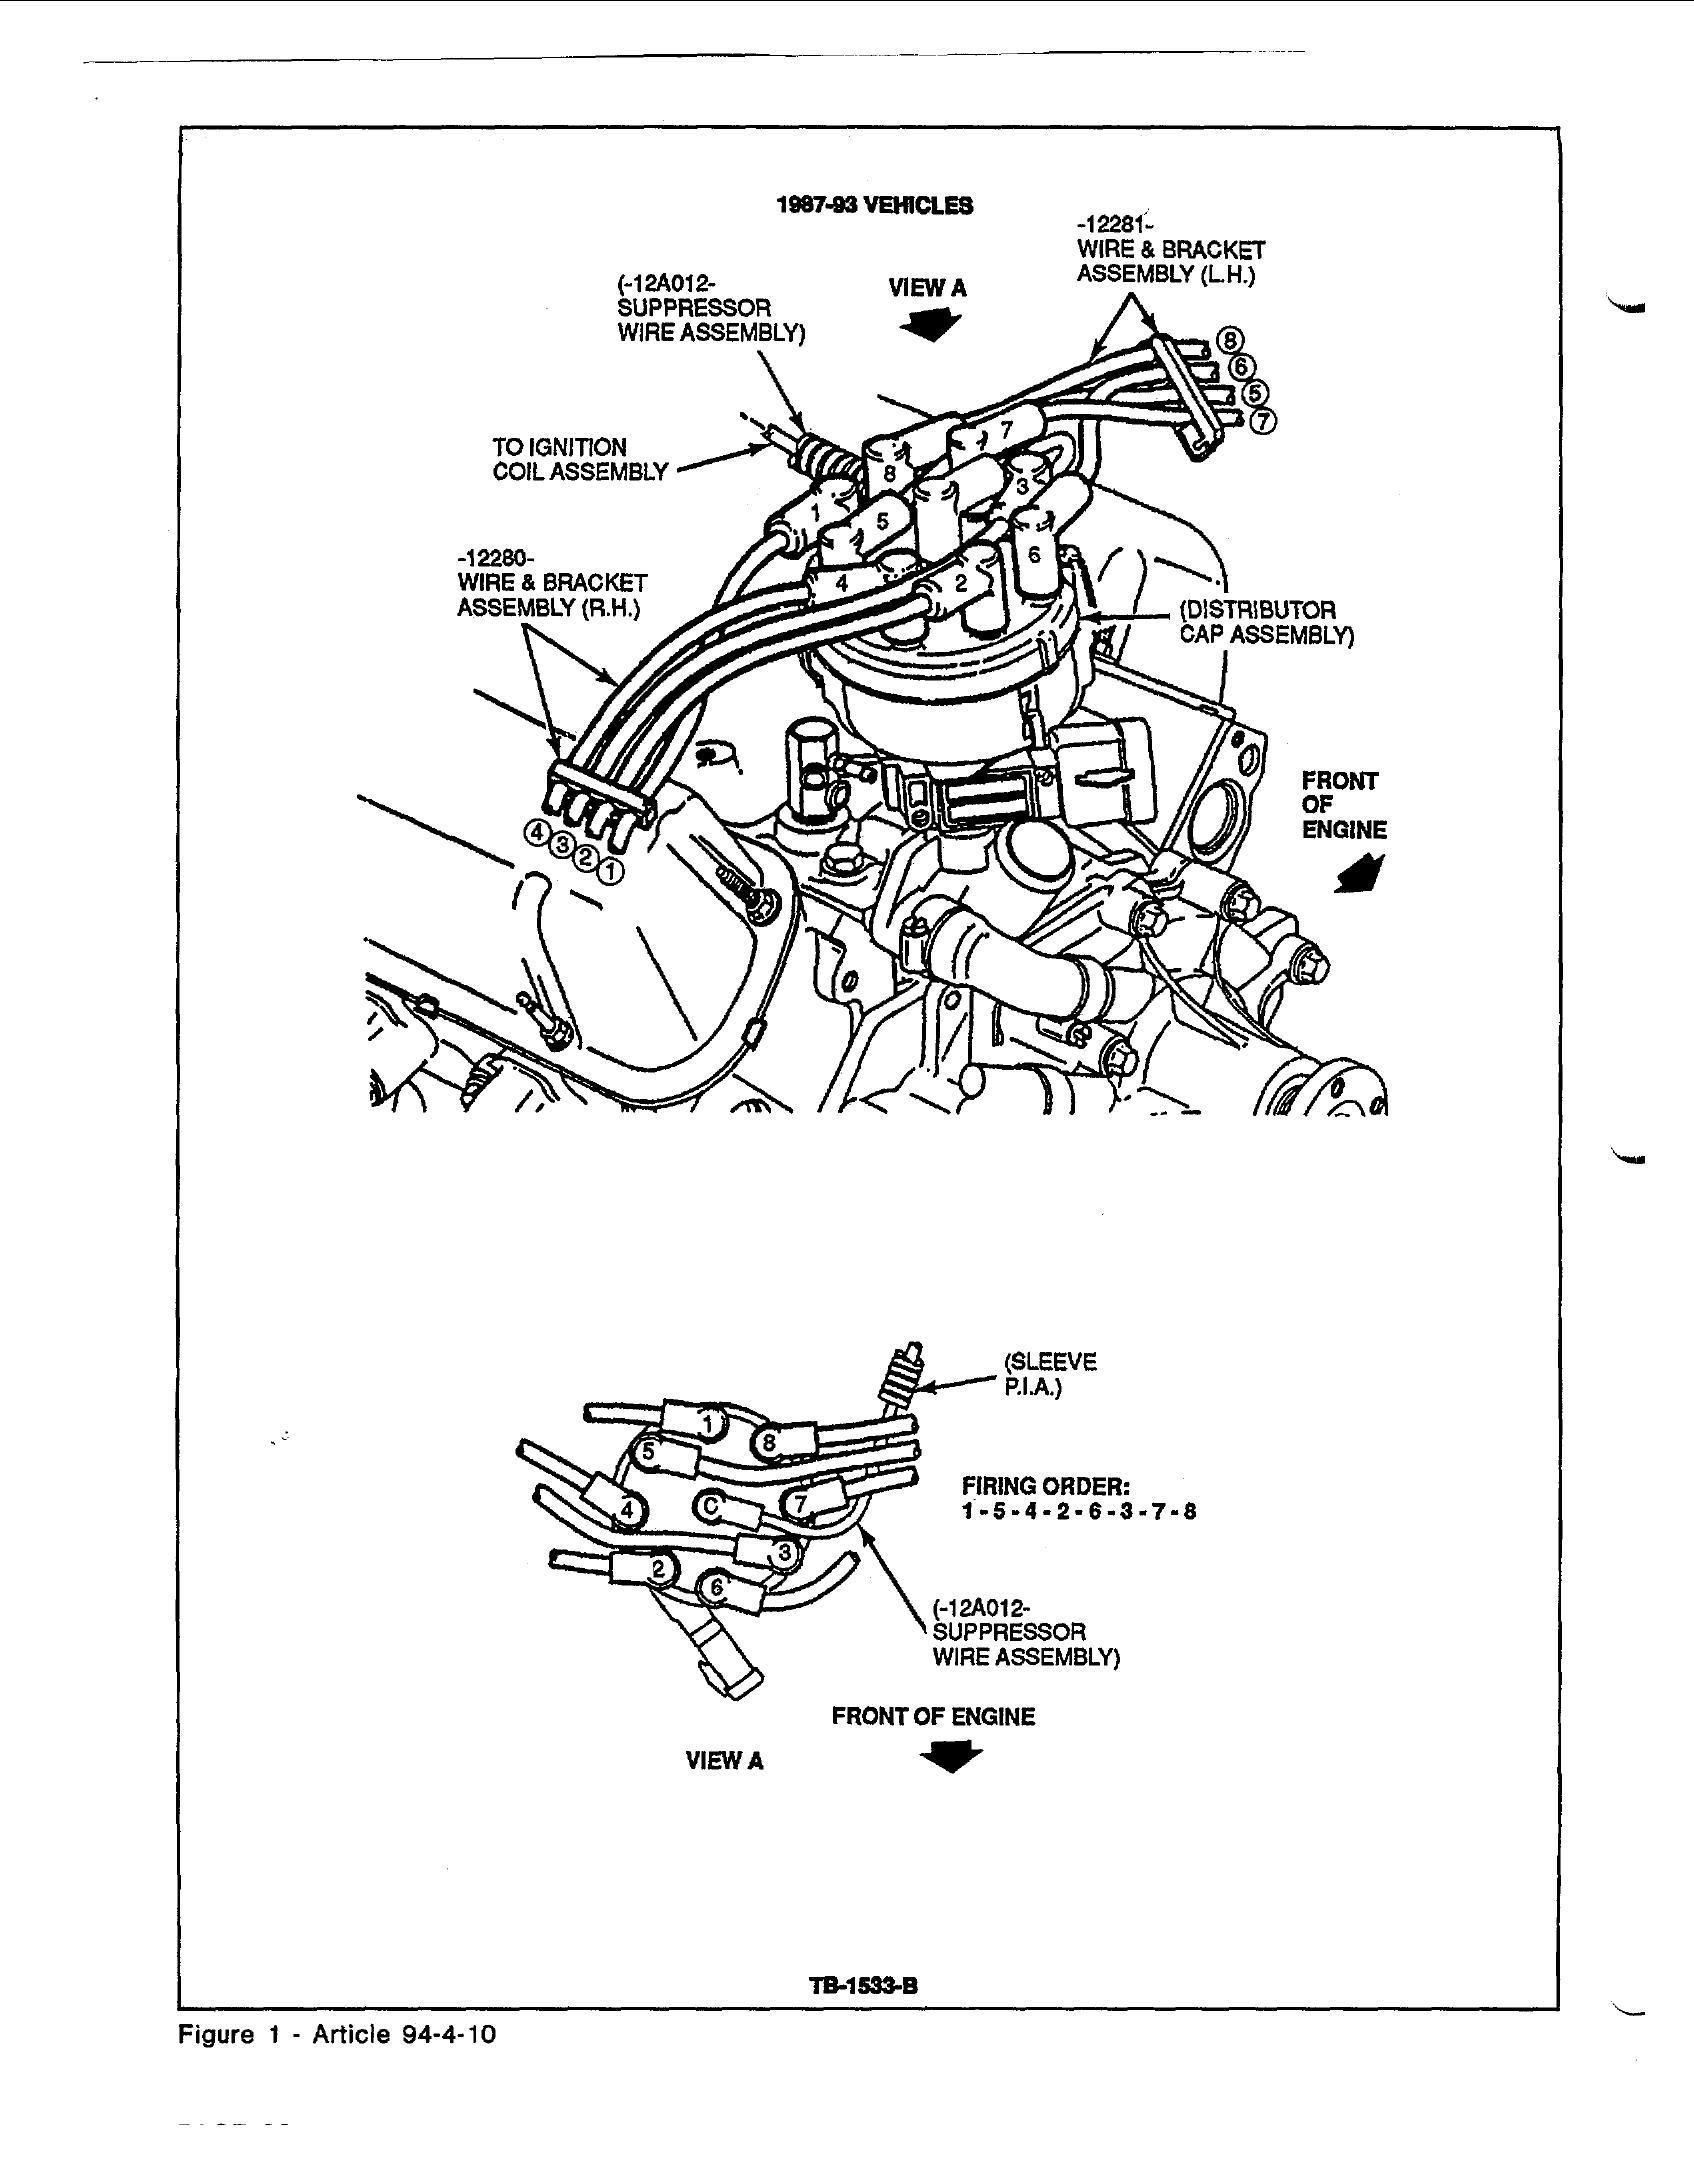 1990 mustang 2 3 wiring diagram wiring diagram 1990 ford 2 3 tachometer wire diagram home wiring diagrams